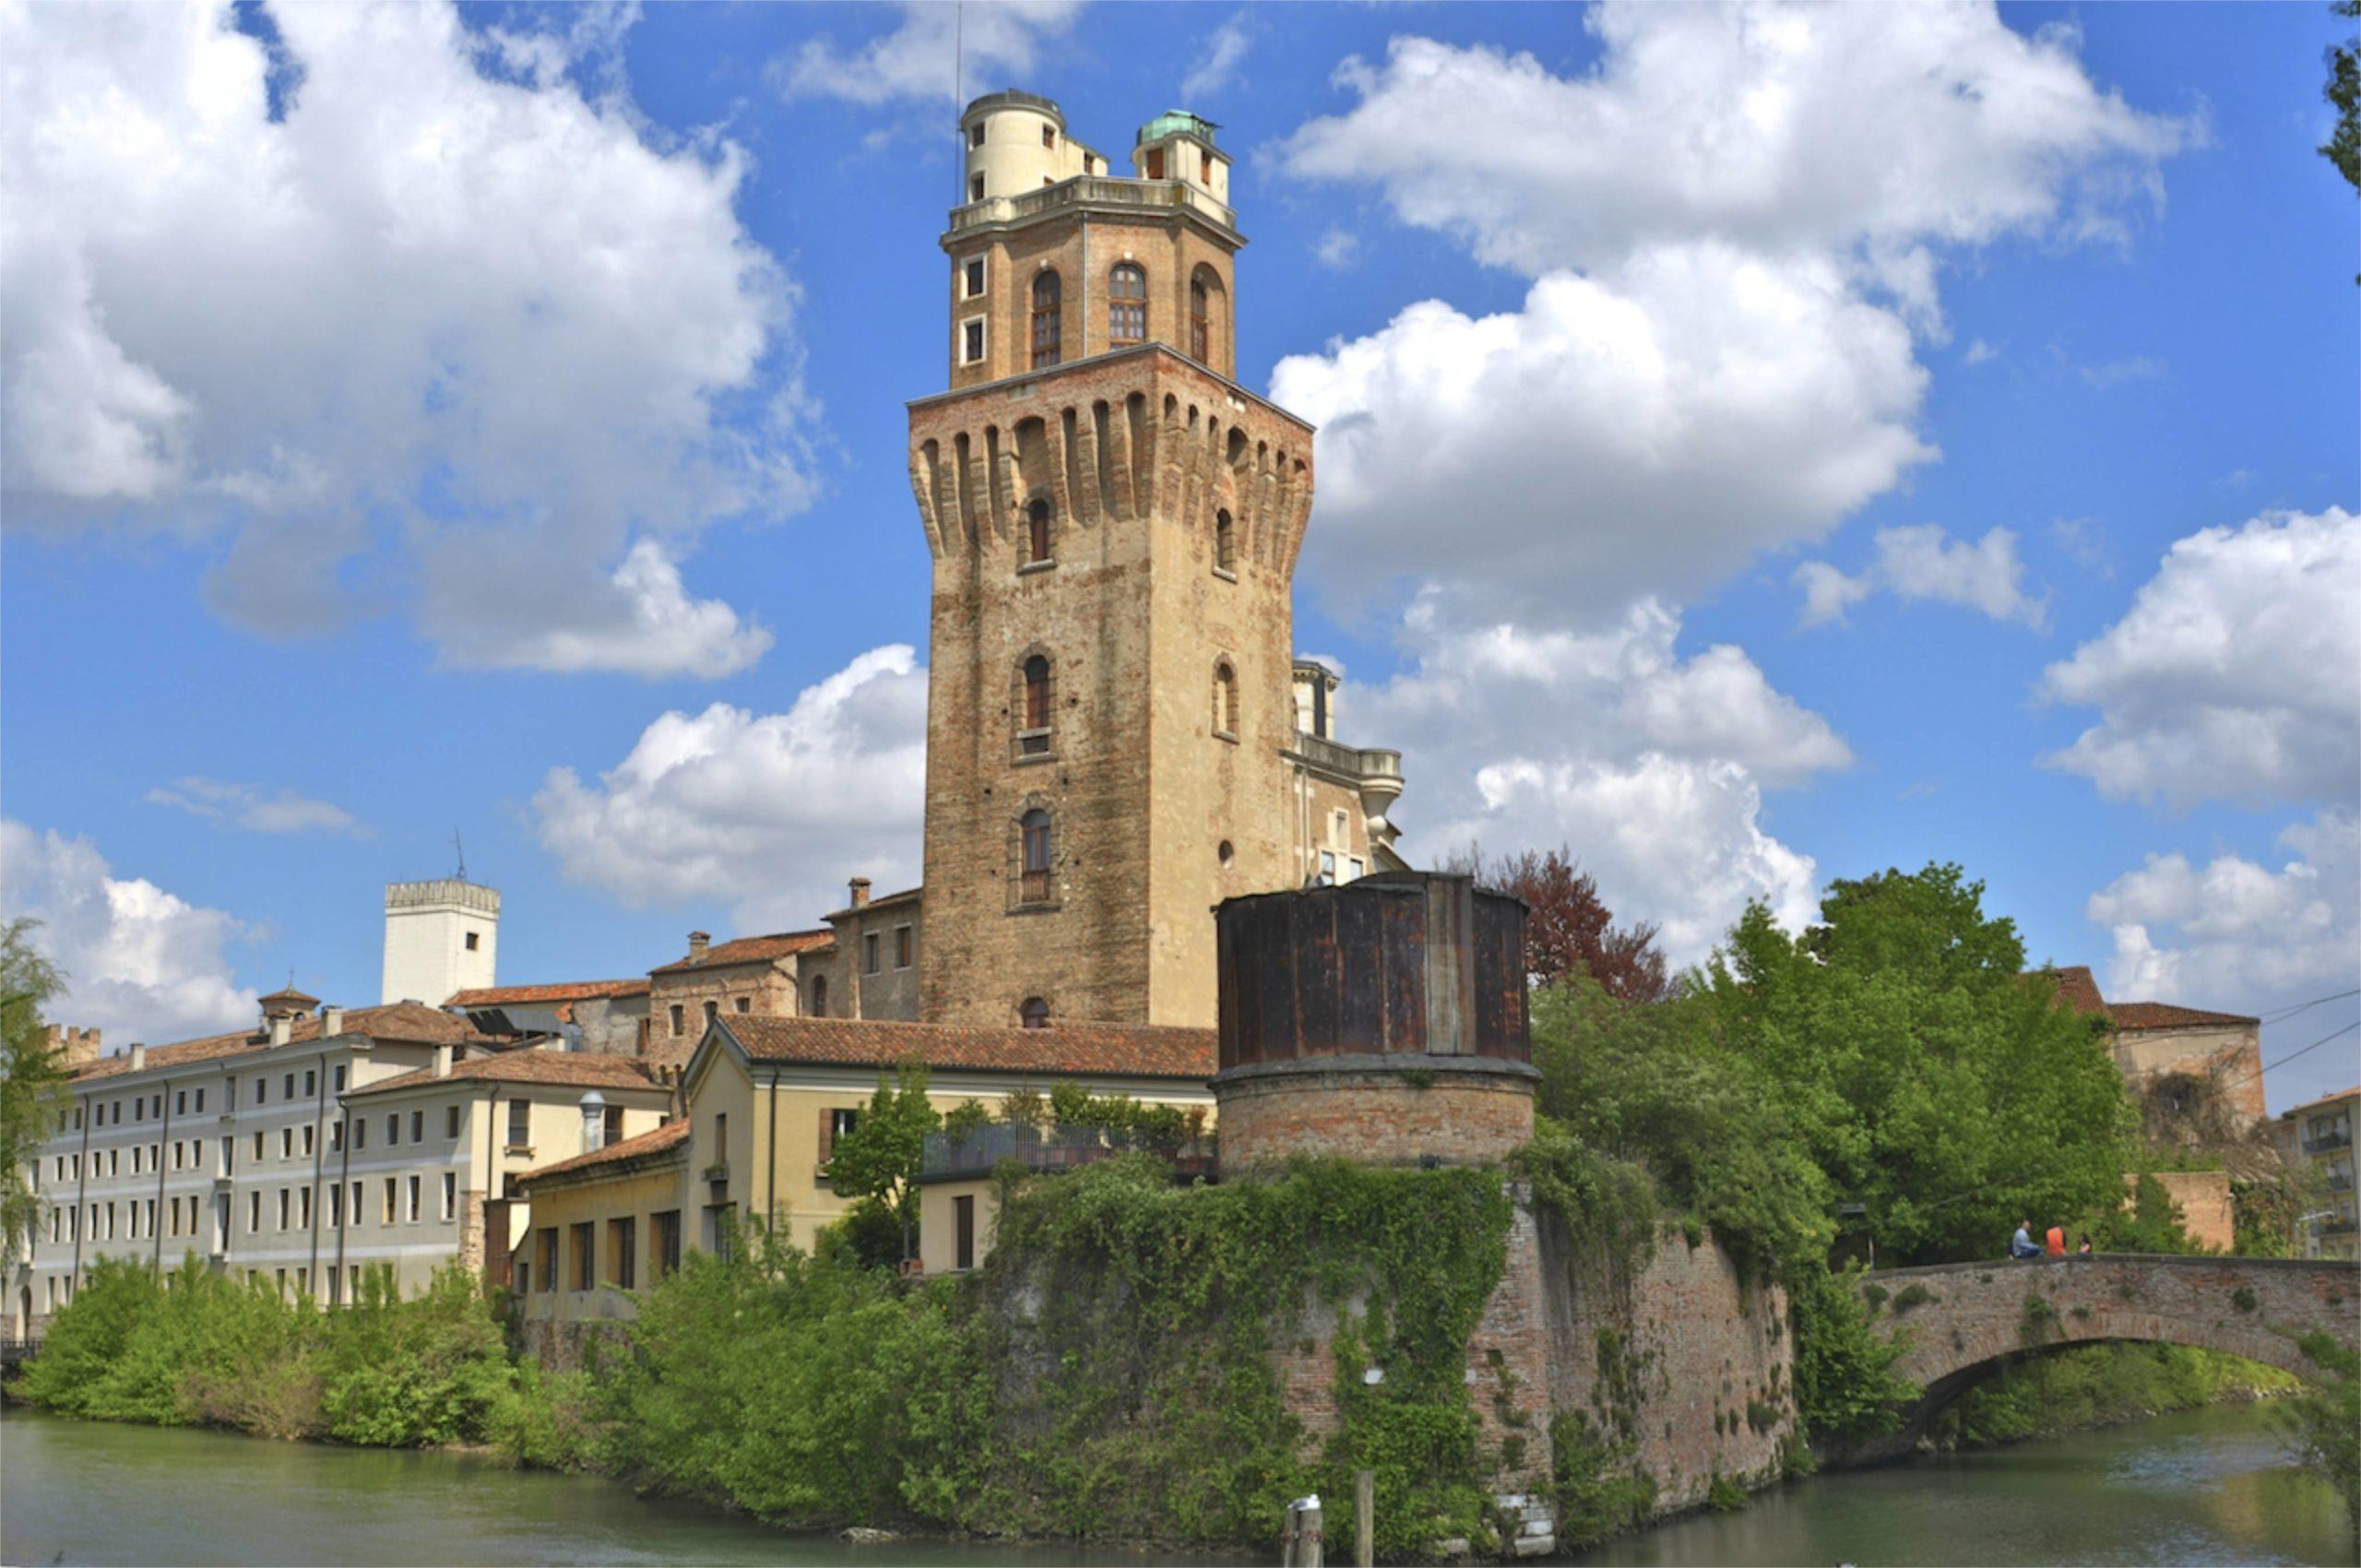 9VWG+CQ Padova, Provincia di Padova